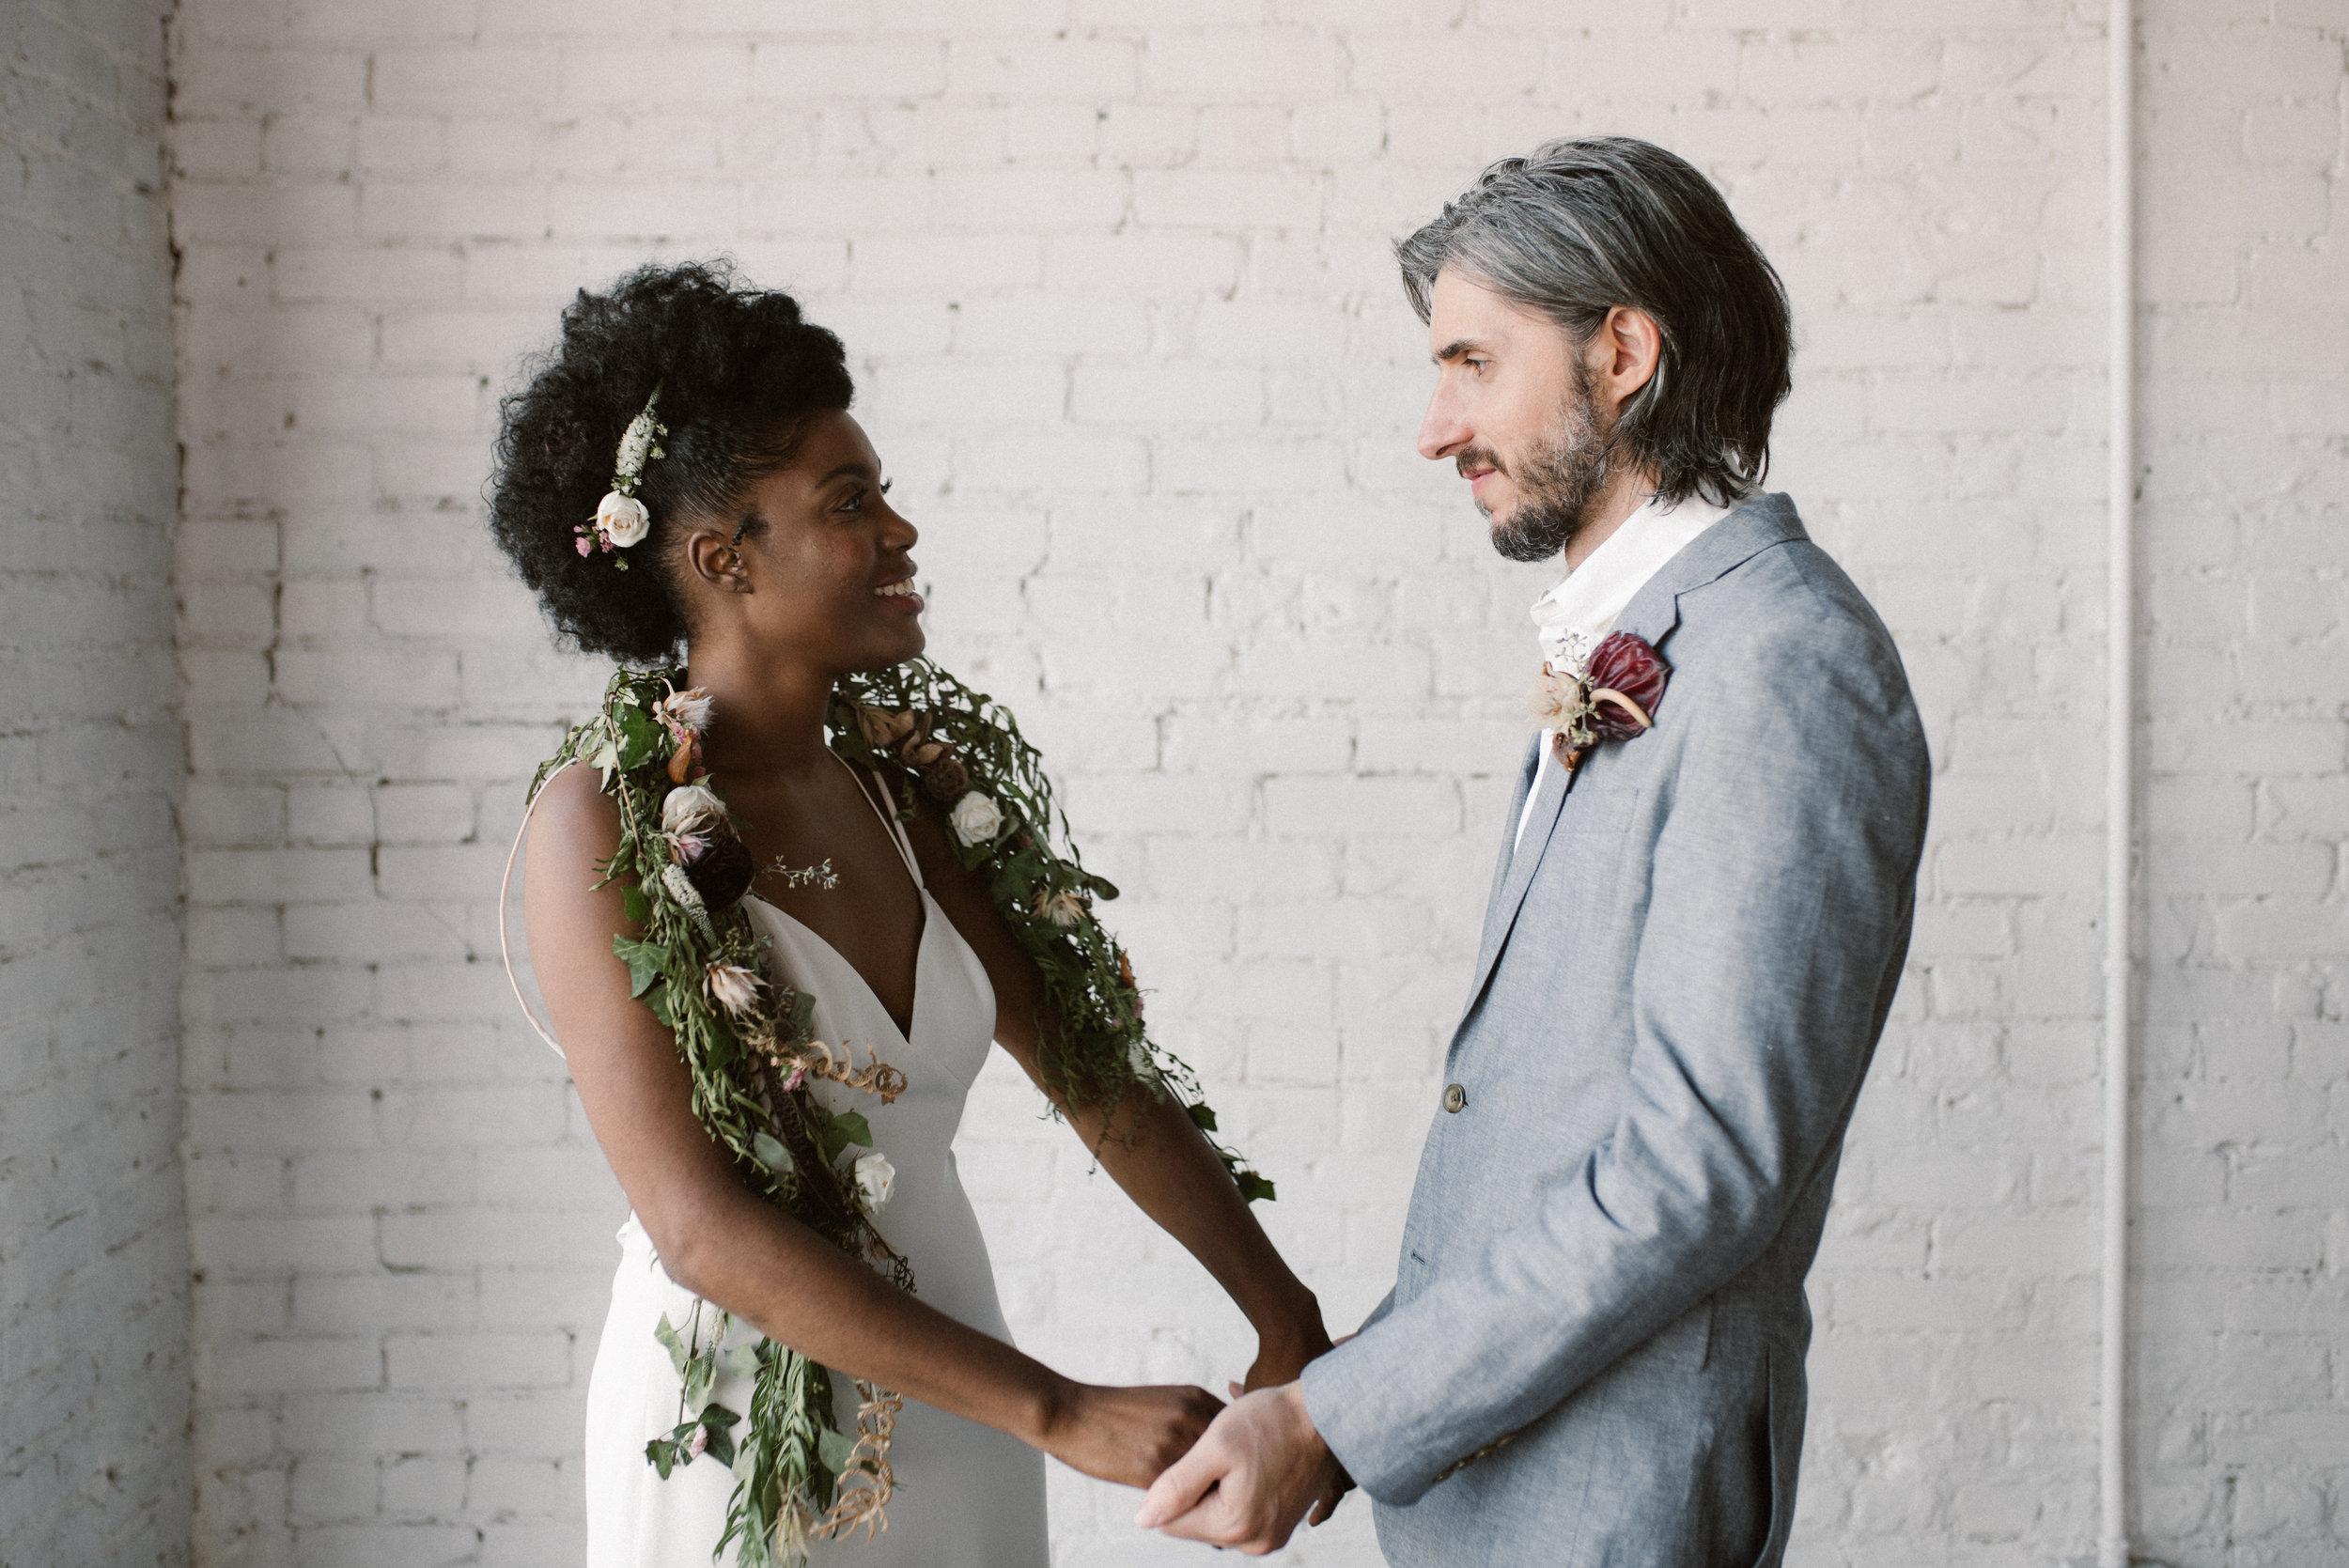 haus-820-minimal-editorial-wedding-styled-shoot-55.jpg